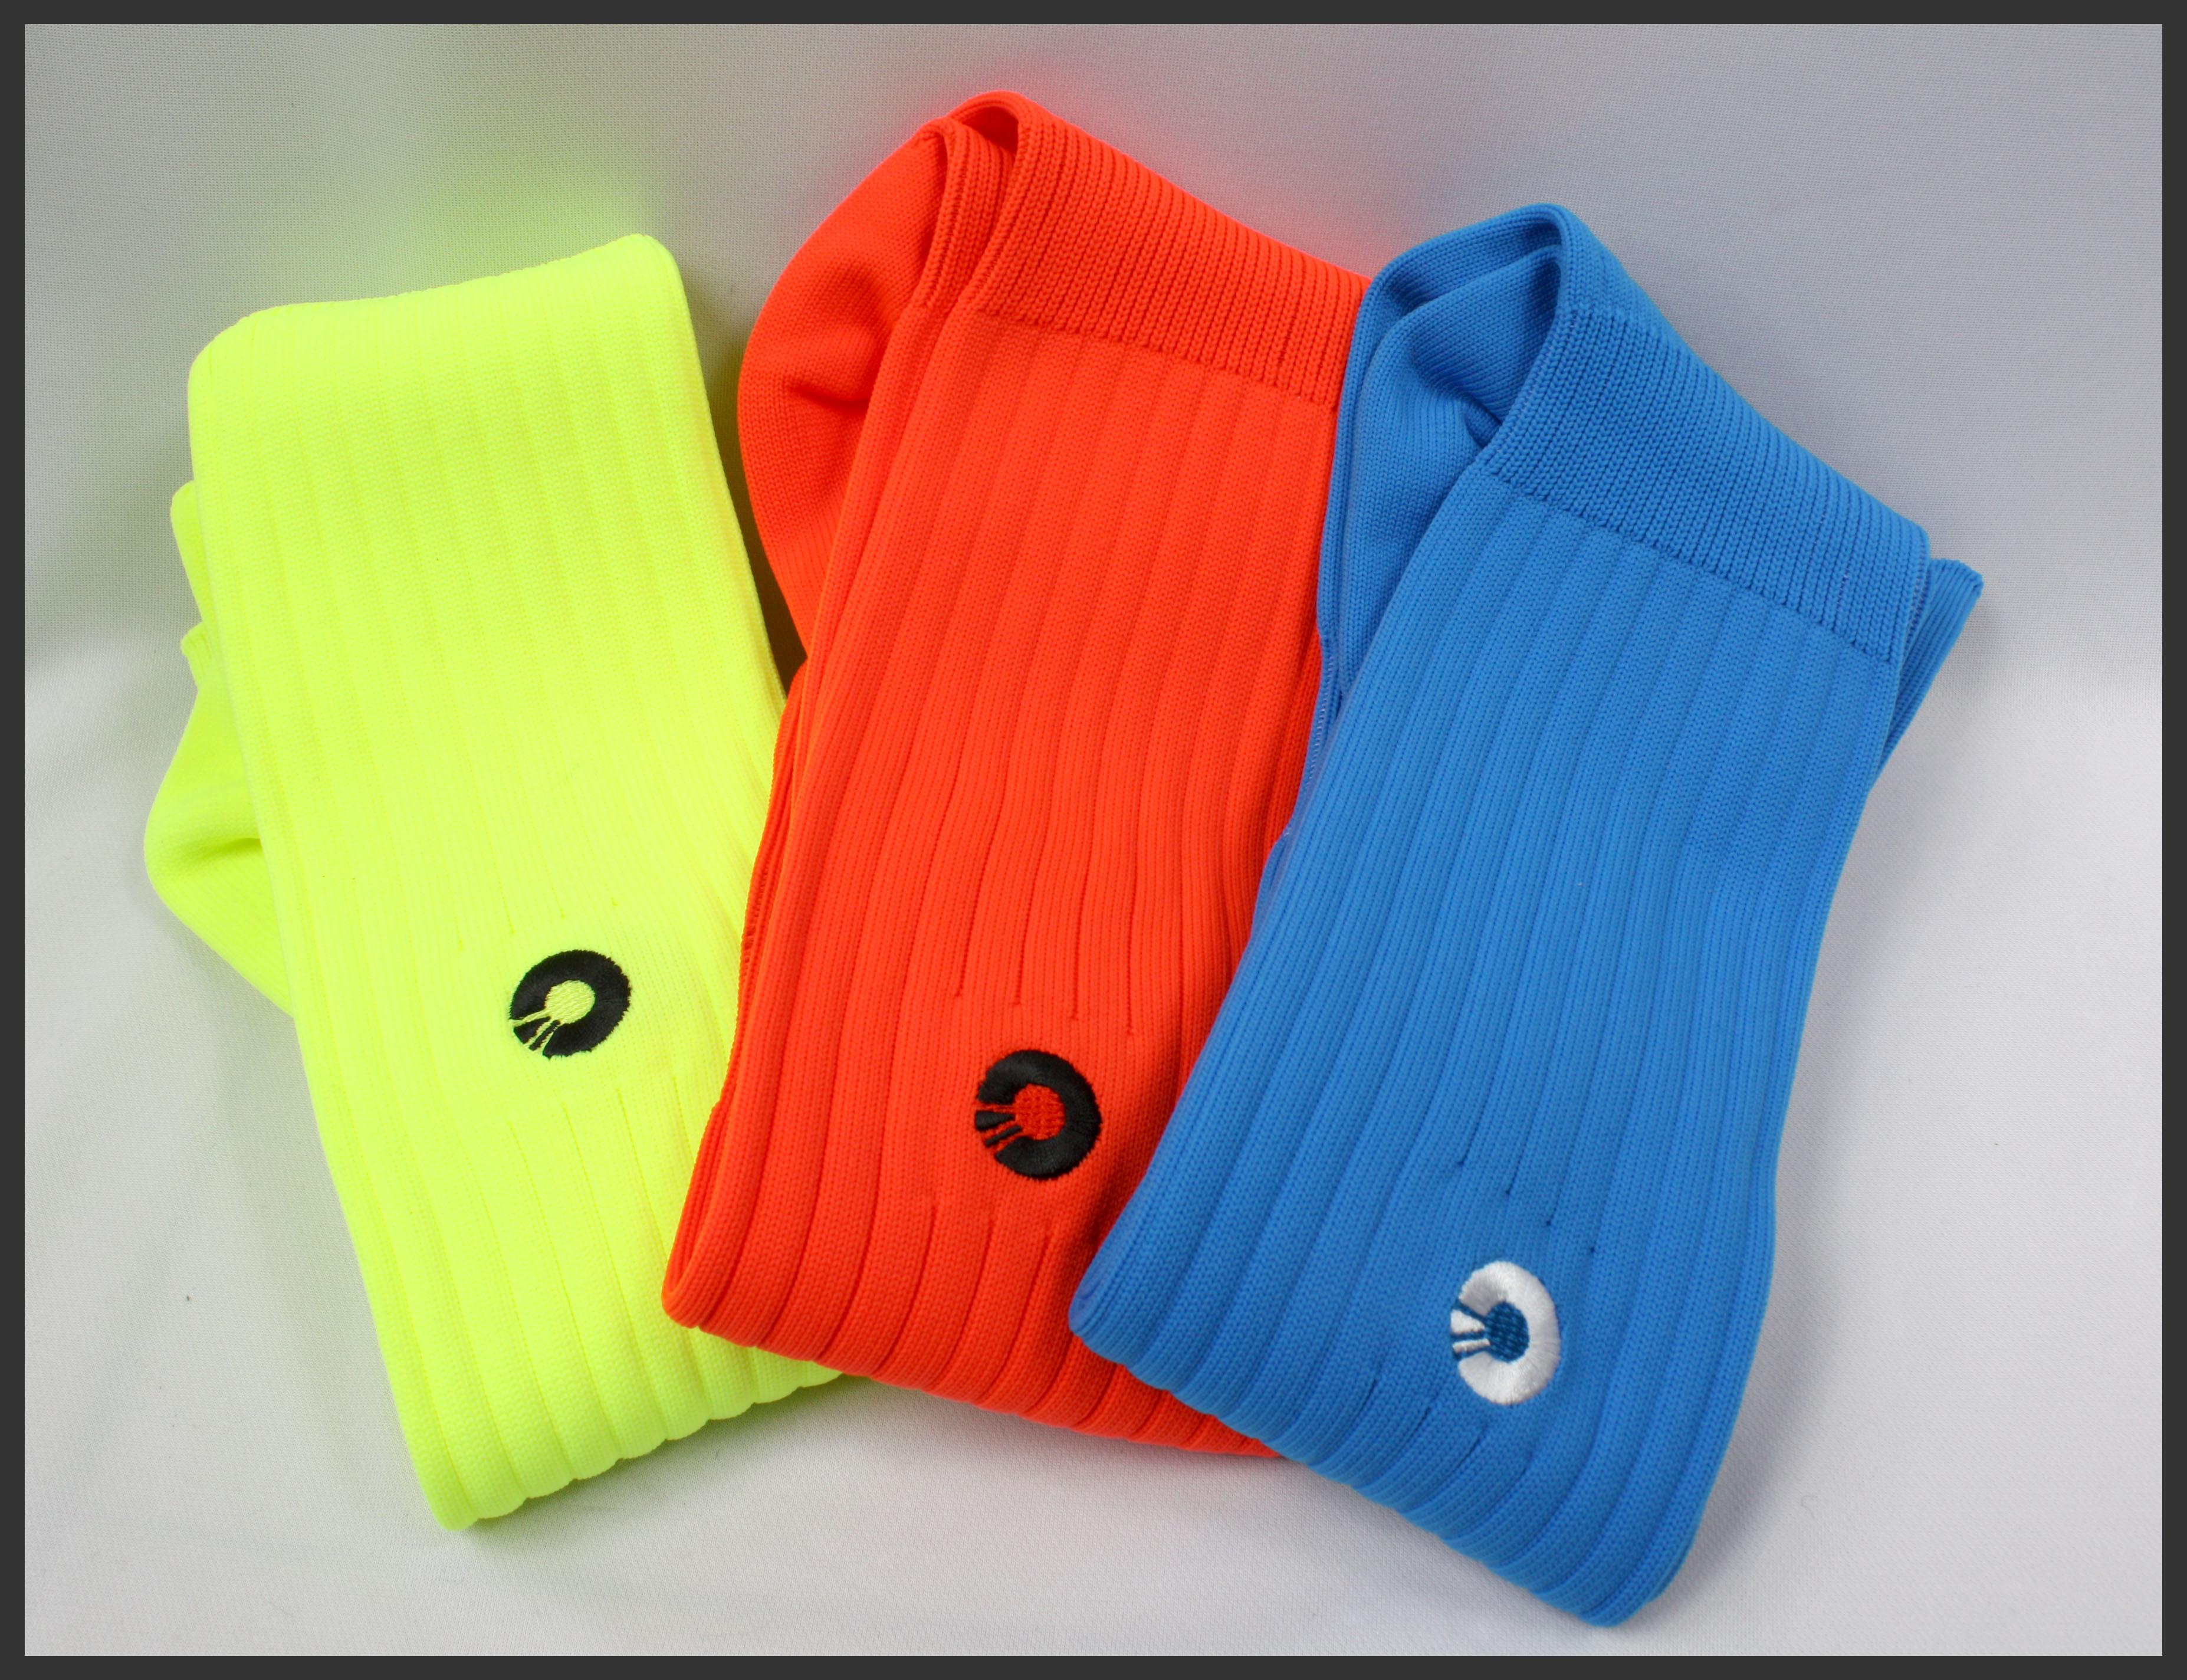 Comsport *彈性足球組合襪*-三色(黃橘藍) 0